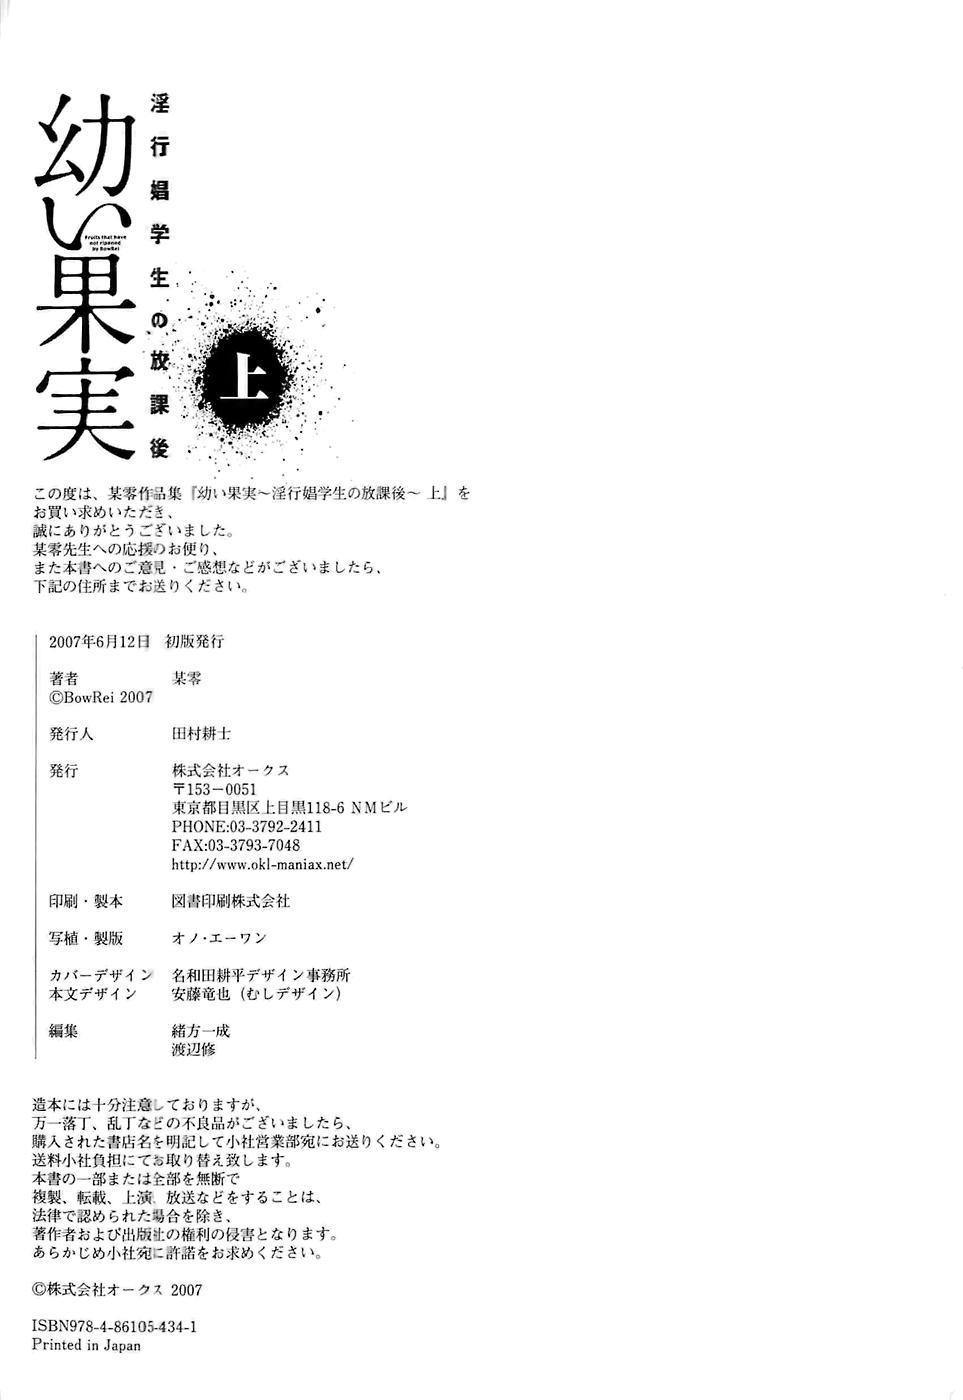 [Bow Rei] Osanai Kajitsu -Inkou Shougakusei no Houkago- Jou 179